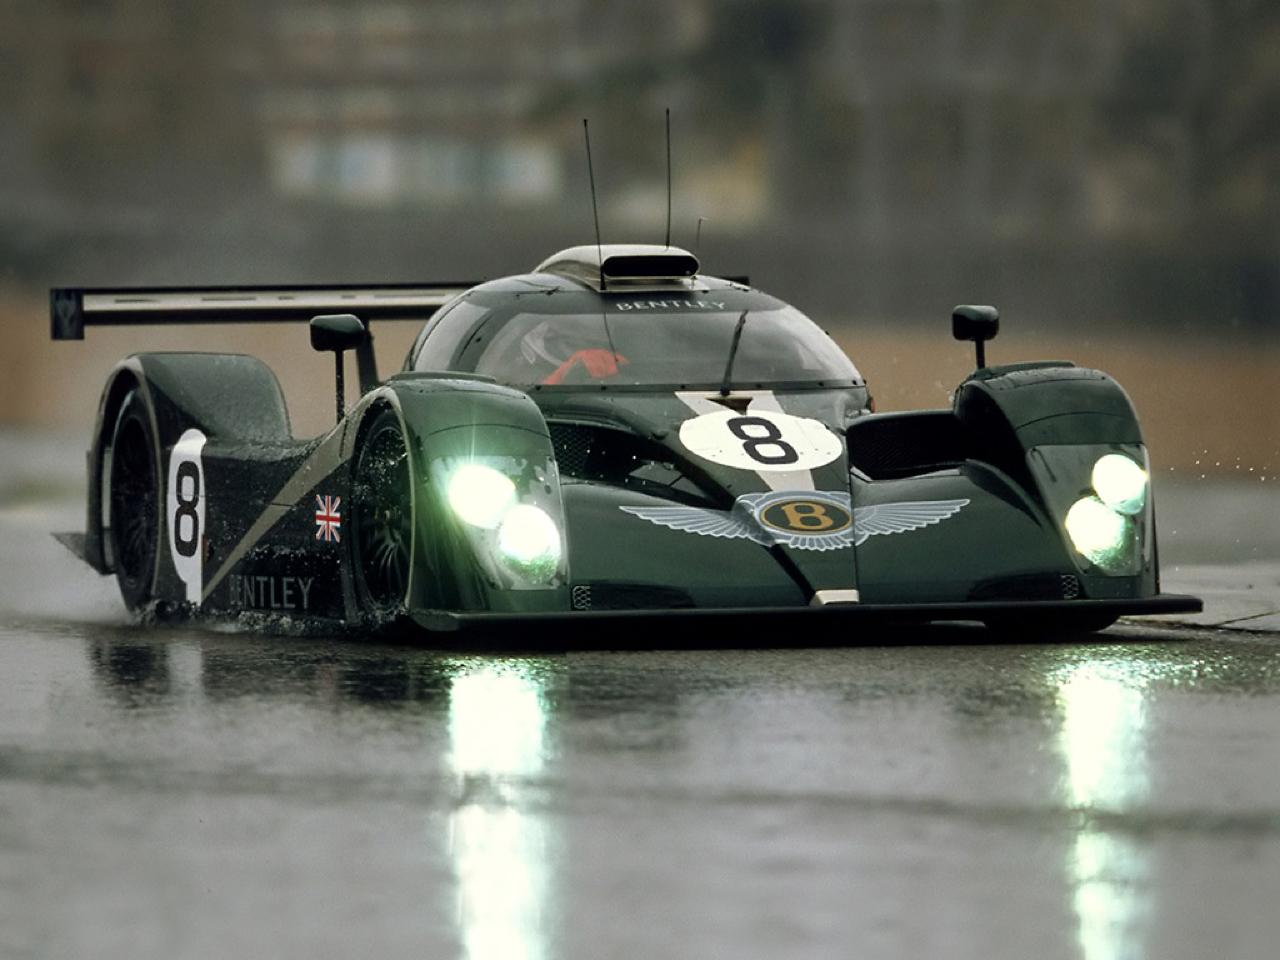 Engine Sound : Bentley Speed 8 - 3 années pour 1 victoire ! 34